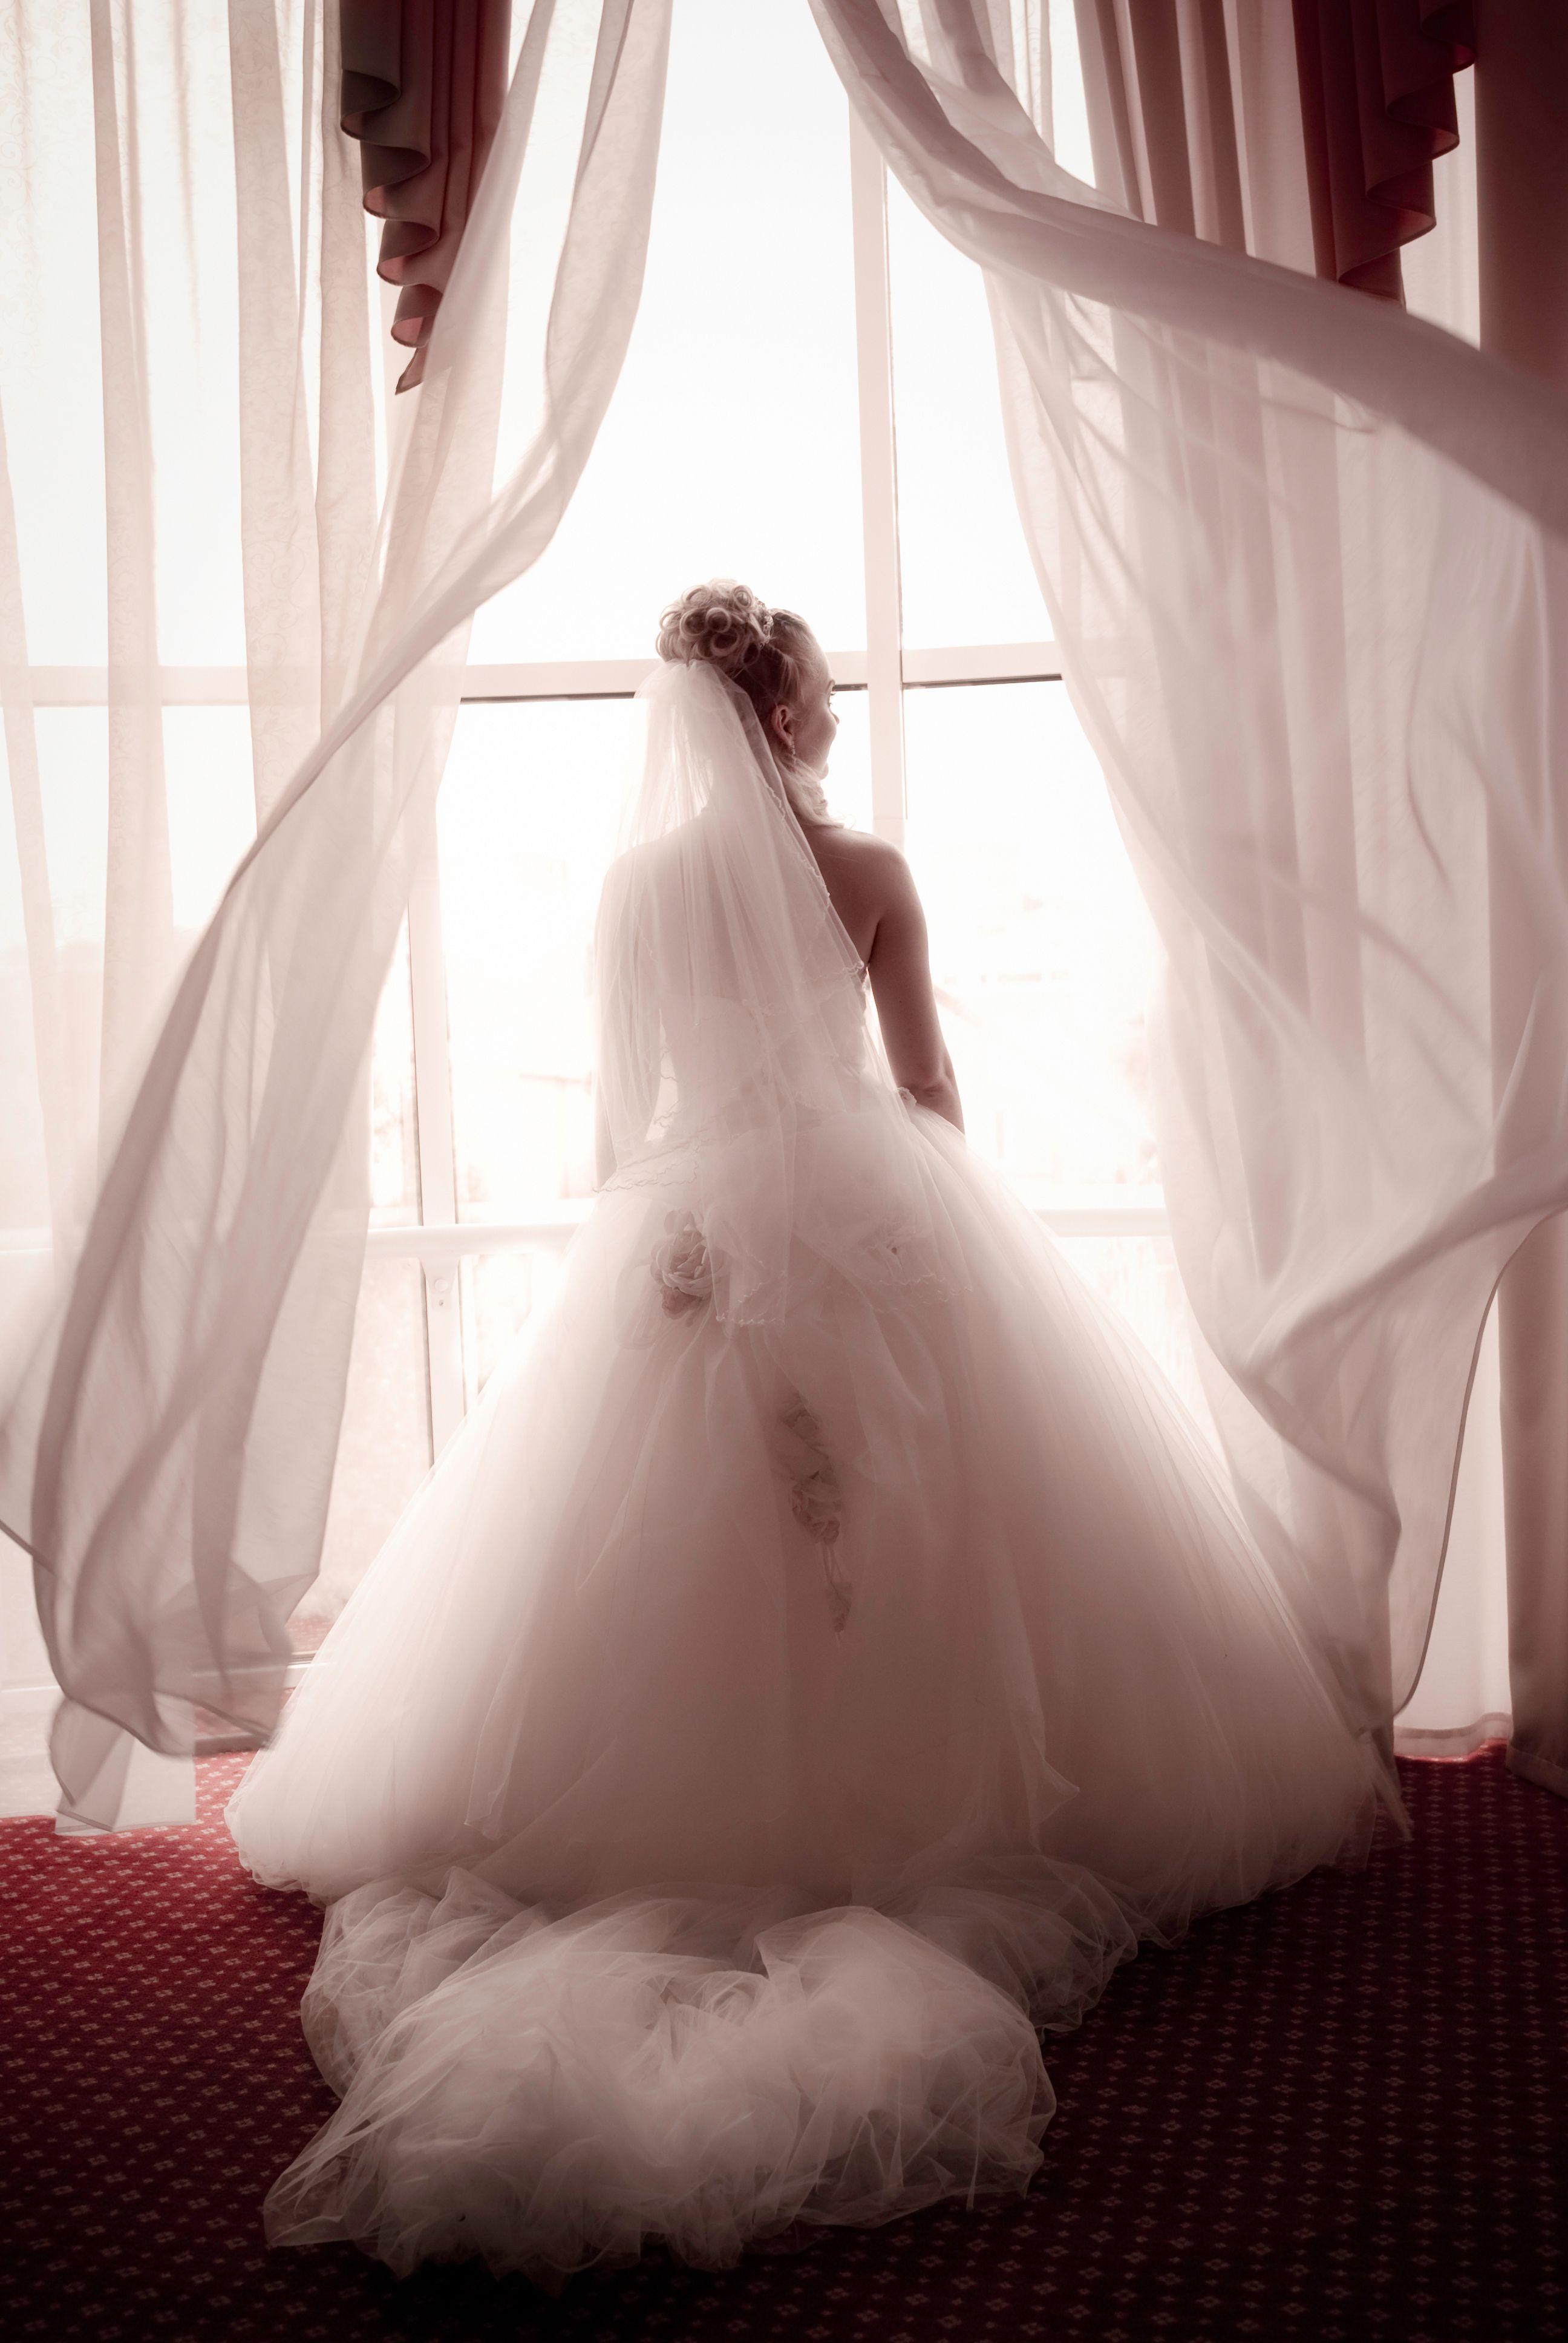 Love this pose. #wedding #photography | Young bride, Ballroom wedding, Smoky mountain wedding